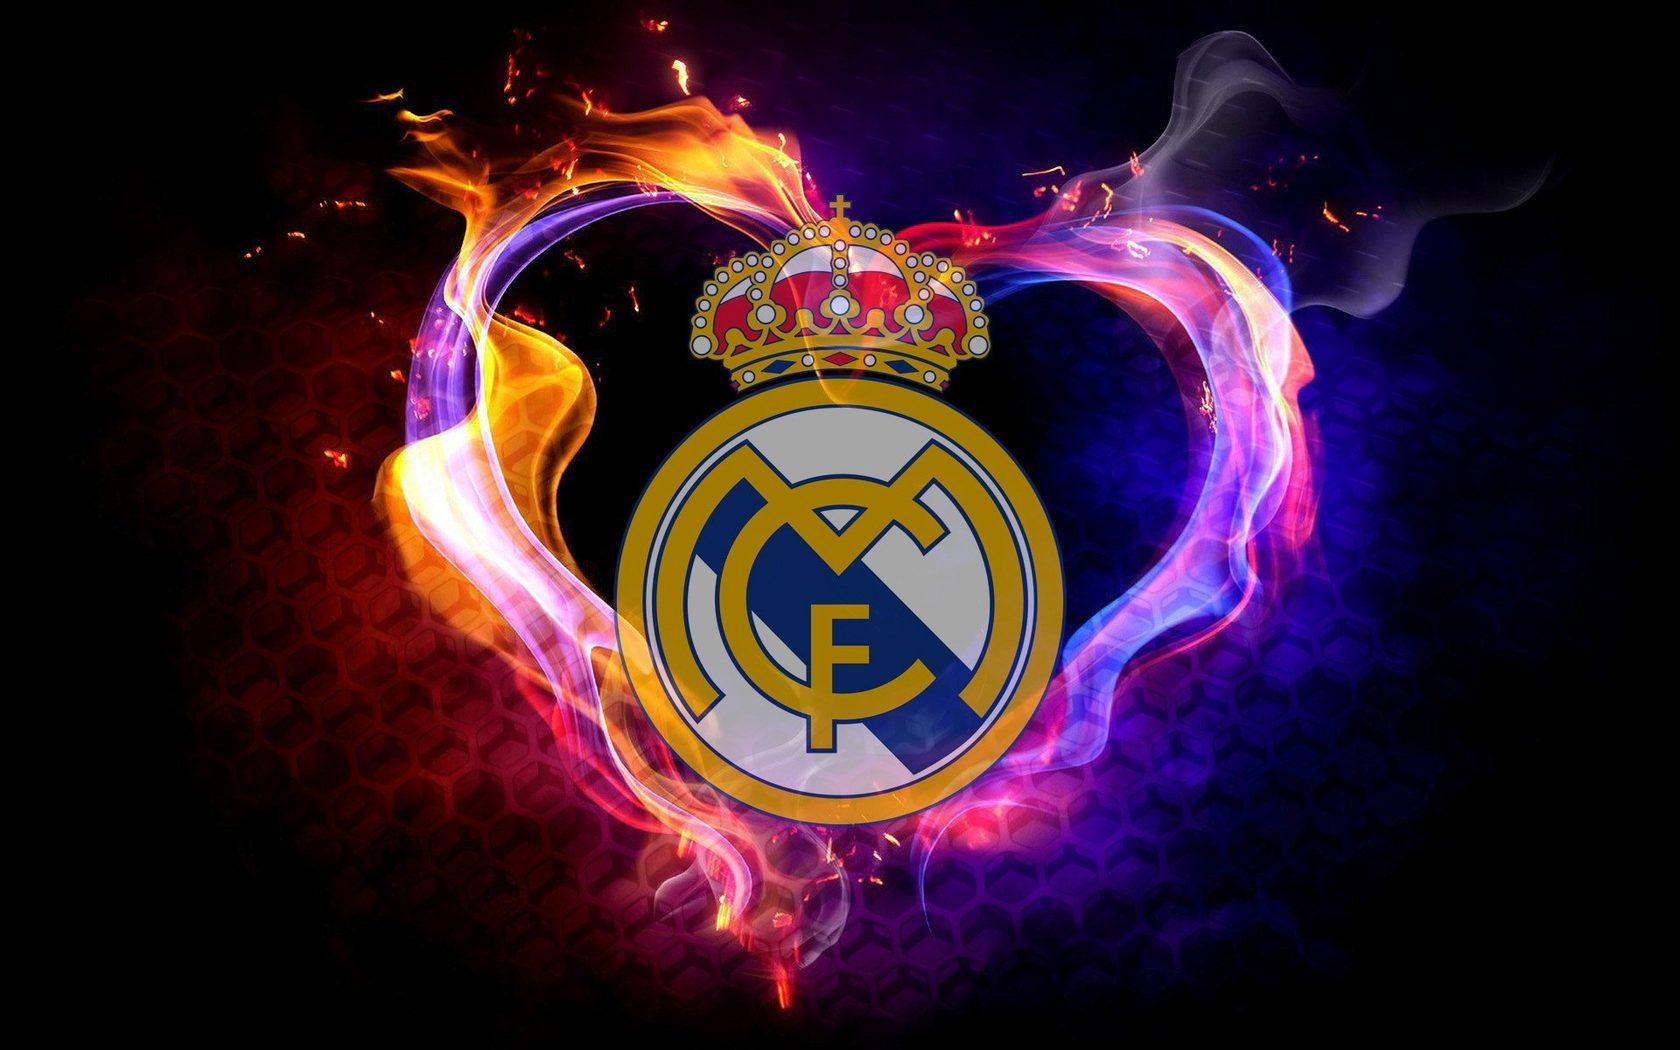 Sony и «Реал Мадрид» стали стратегическими партнерами